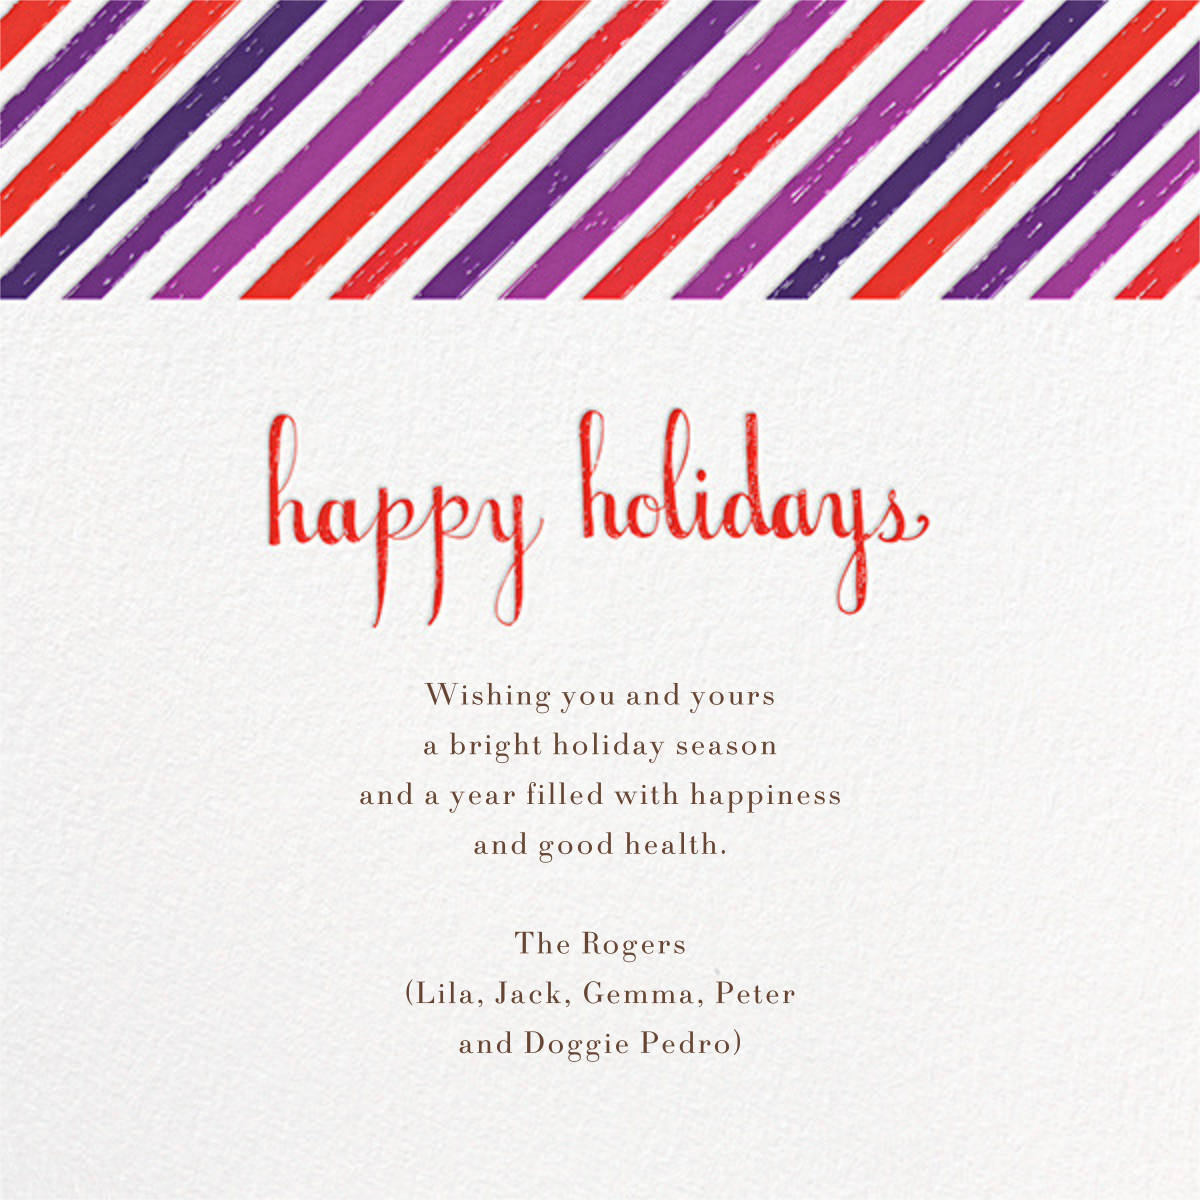 Fido's Knotted Stocking (Square) - Purple - Mr. Boddington's Studio - Holiday cards - card back